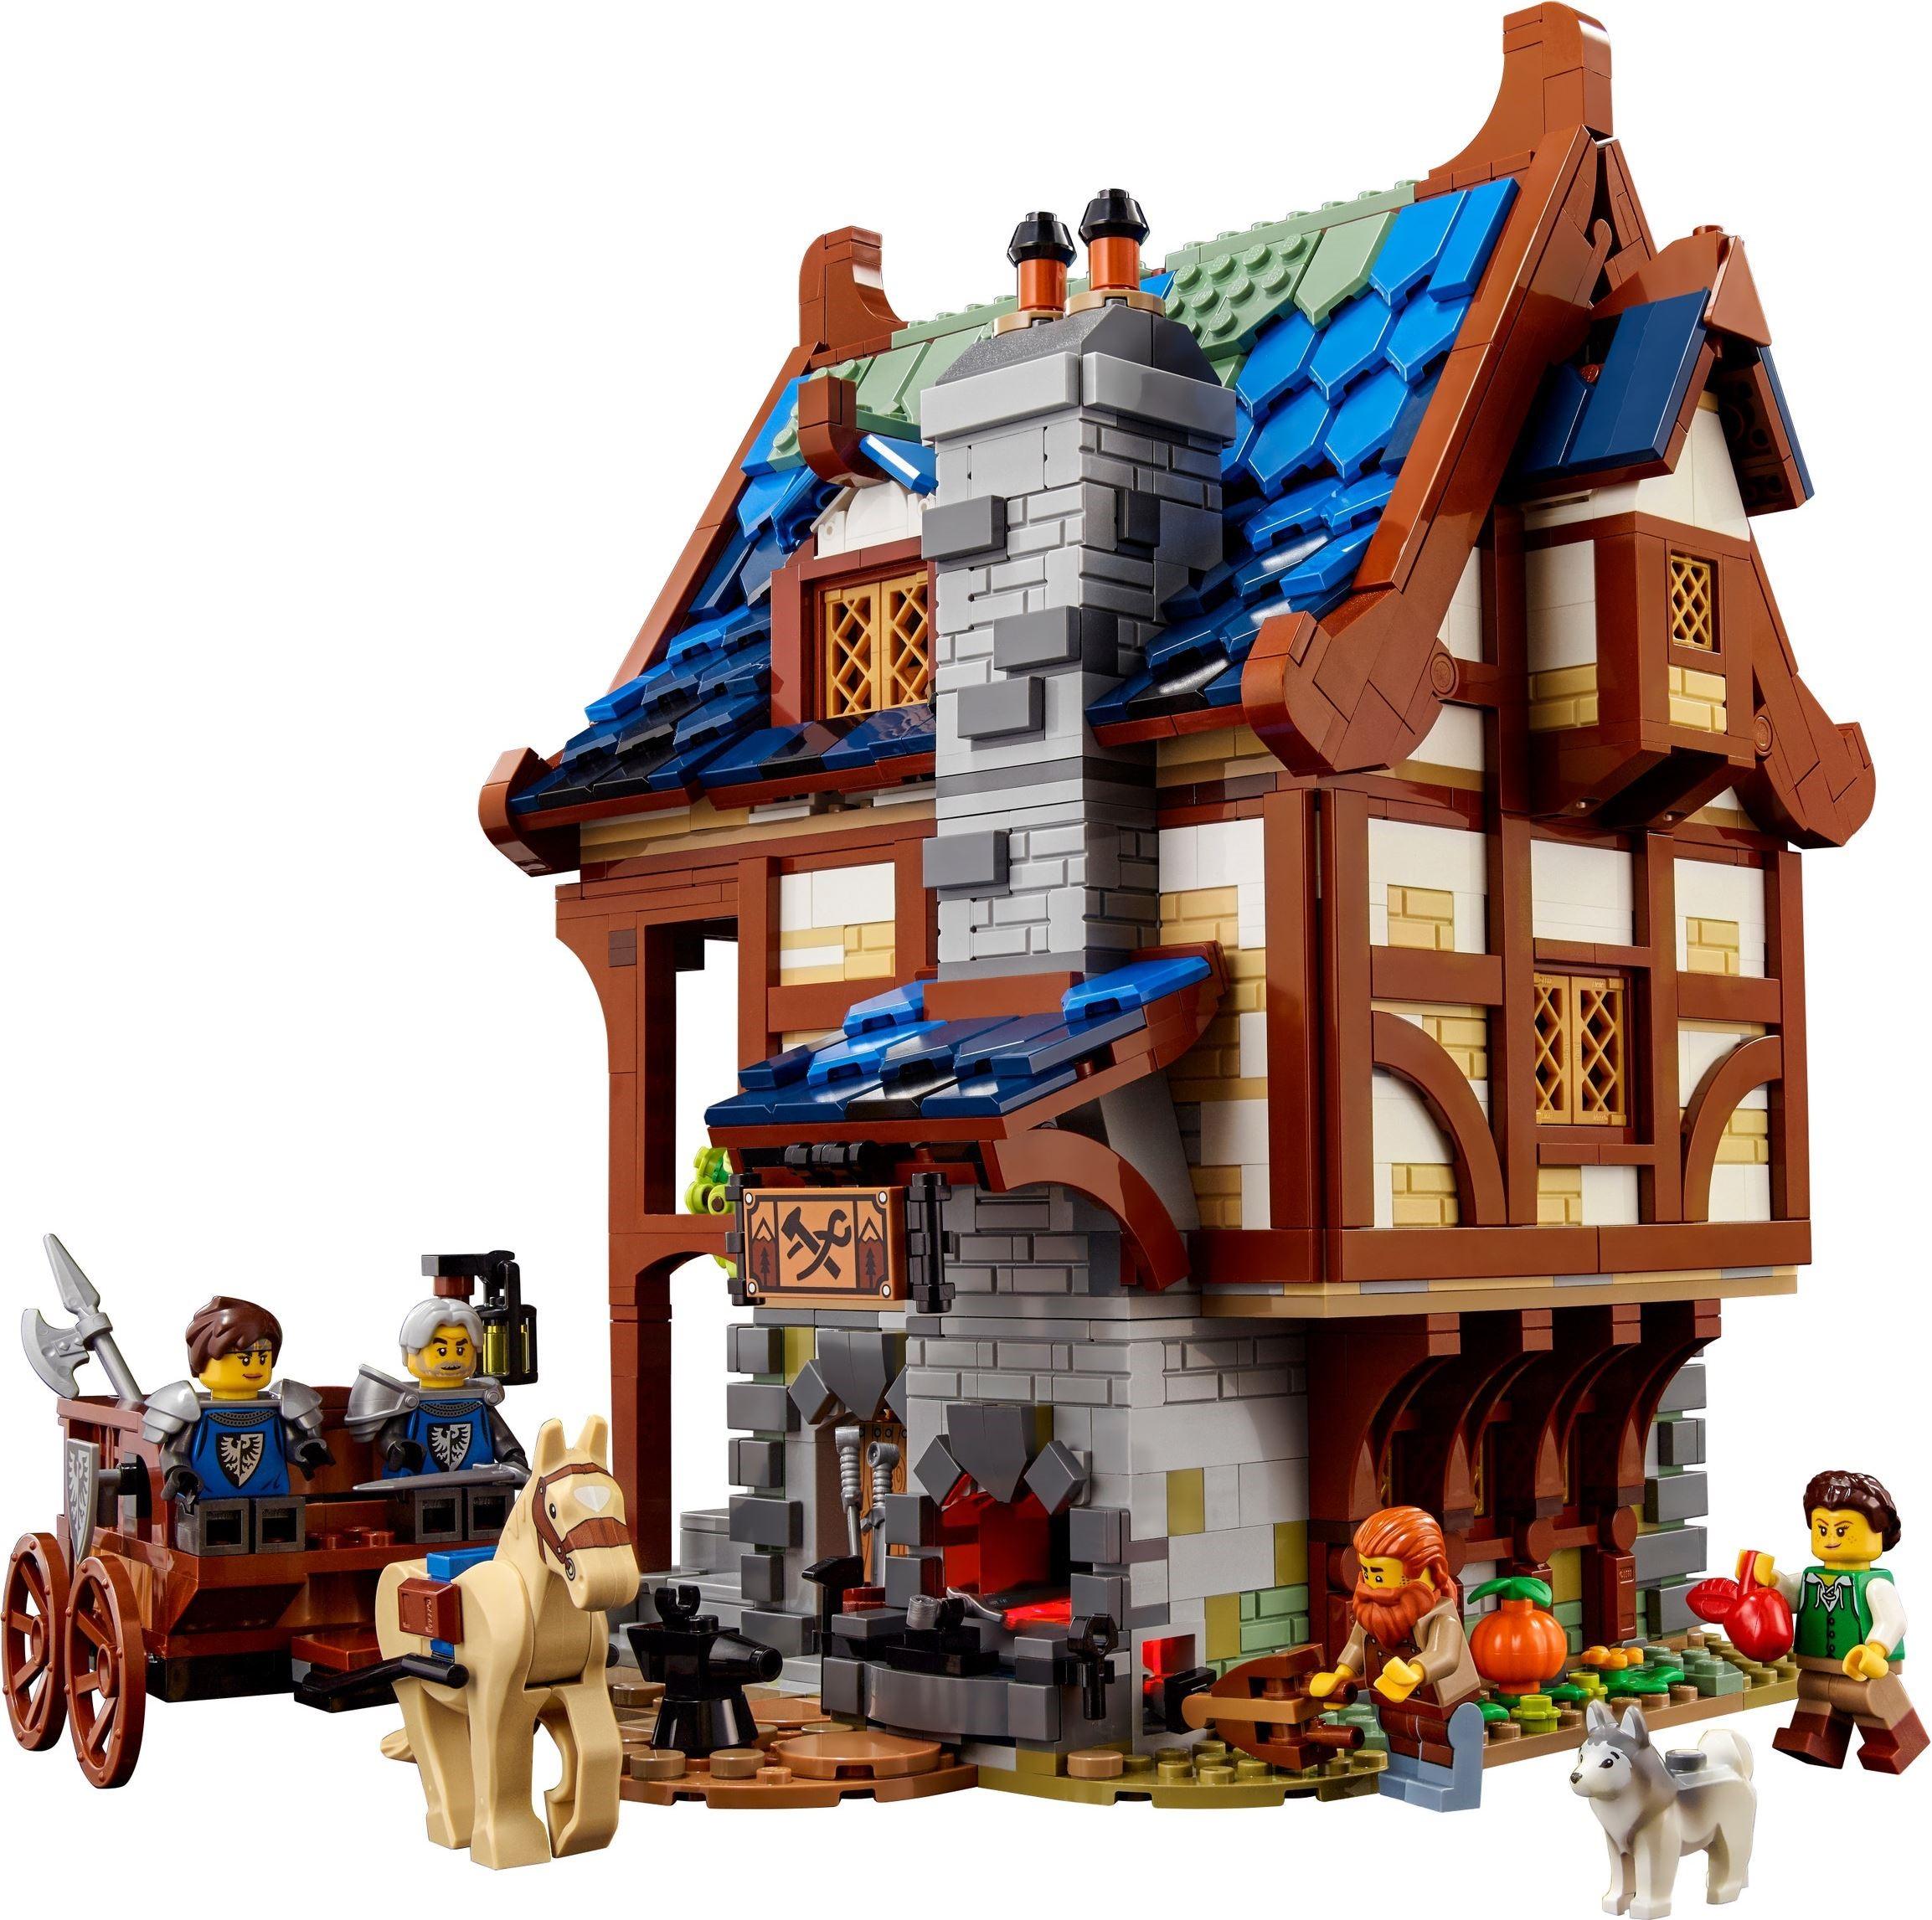 21325 LEGO Ideas Medieval Blacksmith - Đồ chơi LEGO Nhà rèn thời trung cổ.